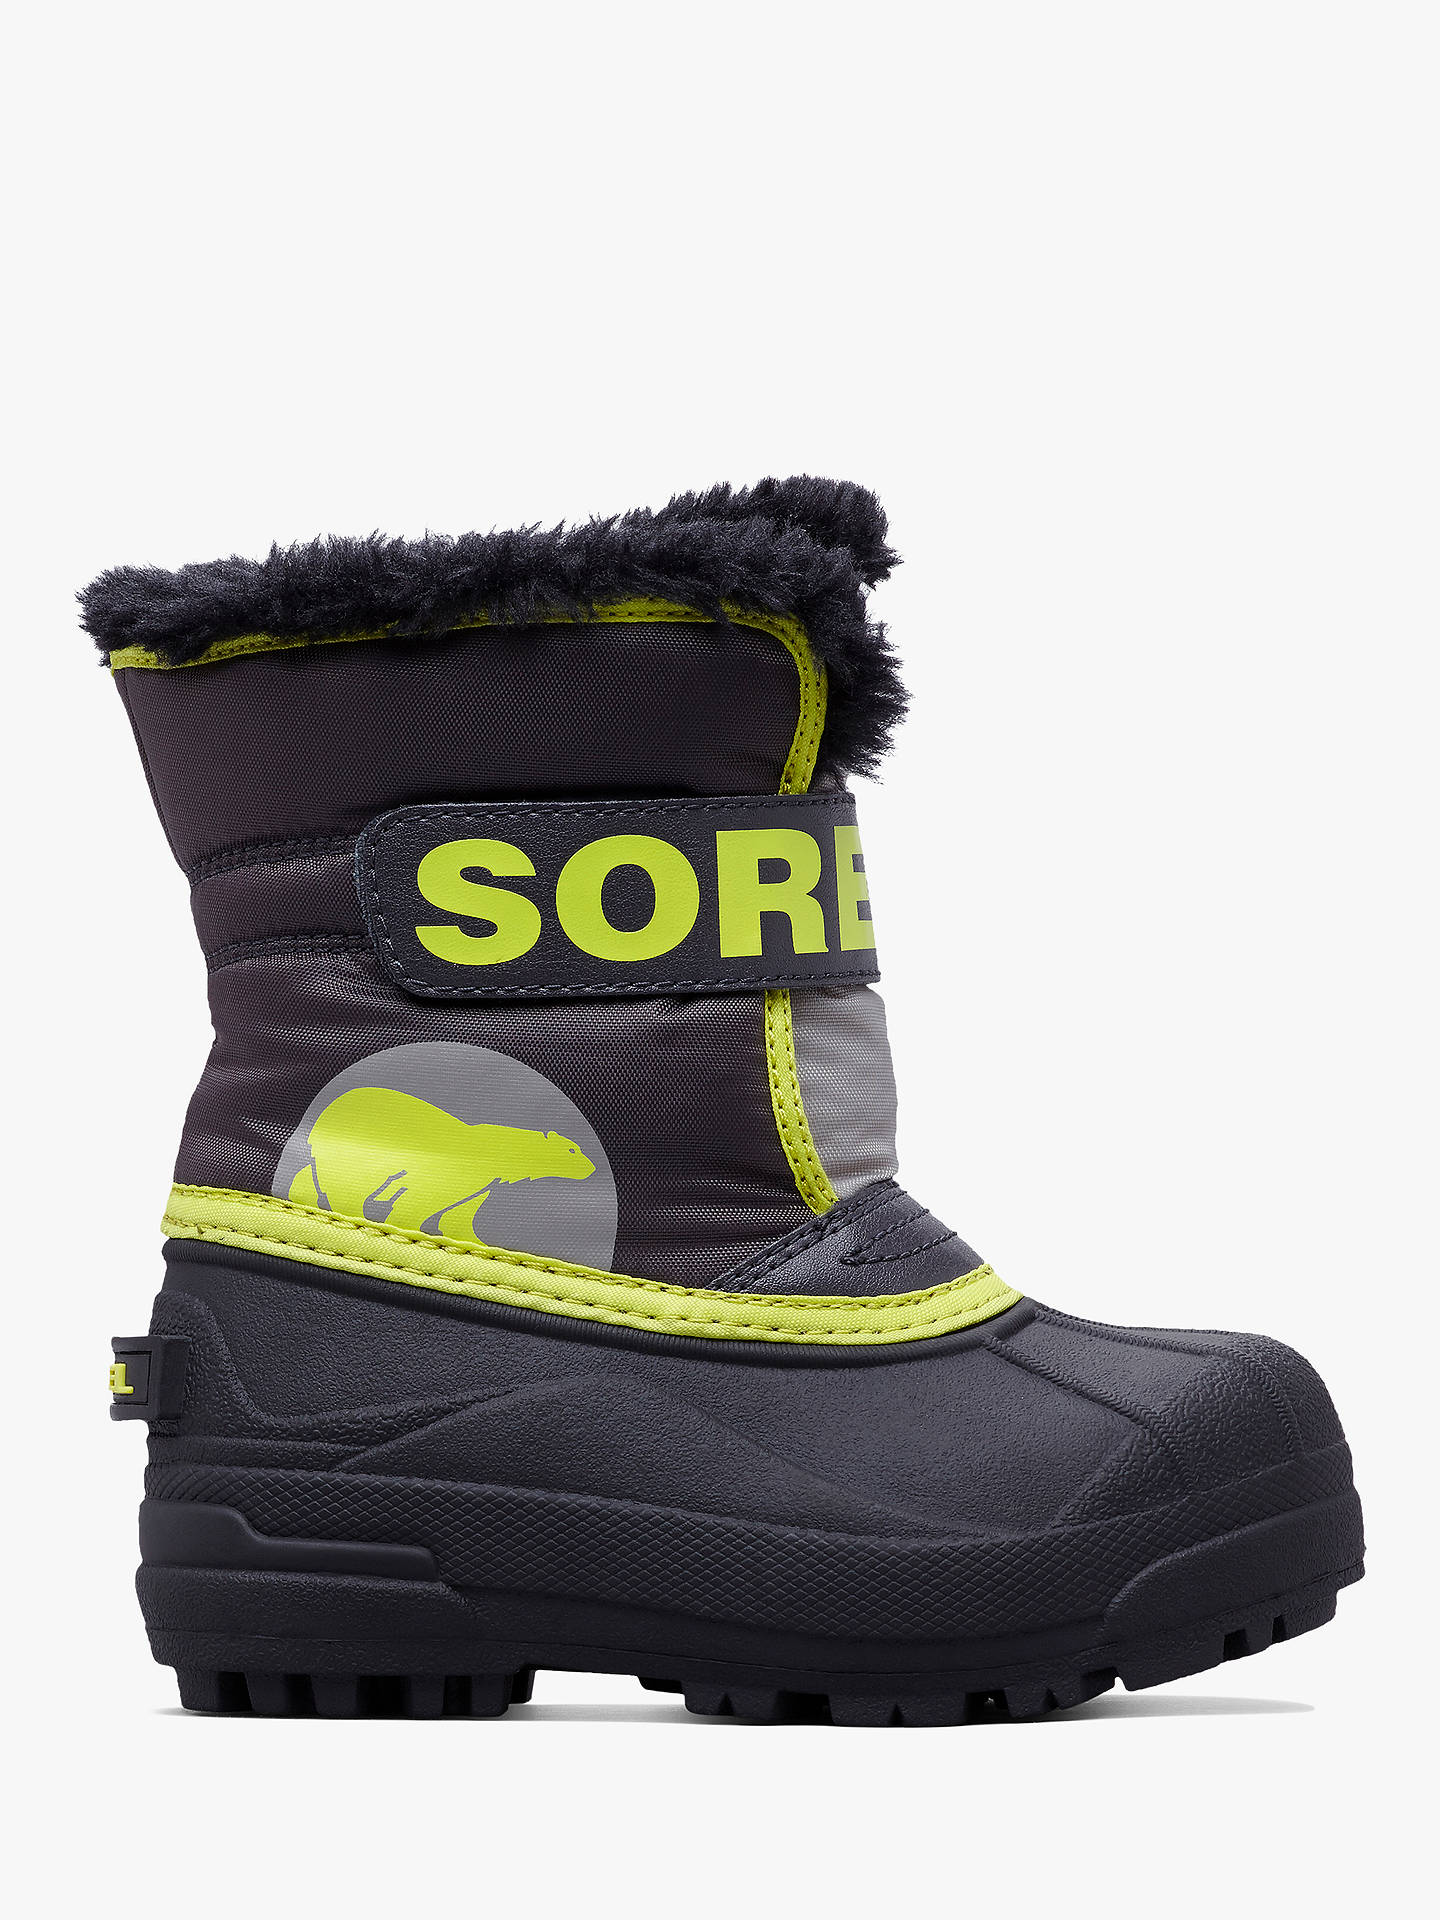 9aa6416bb6 Sorel Children's Snow Commander Snow Boots at John Lewis & Partners